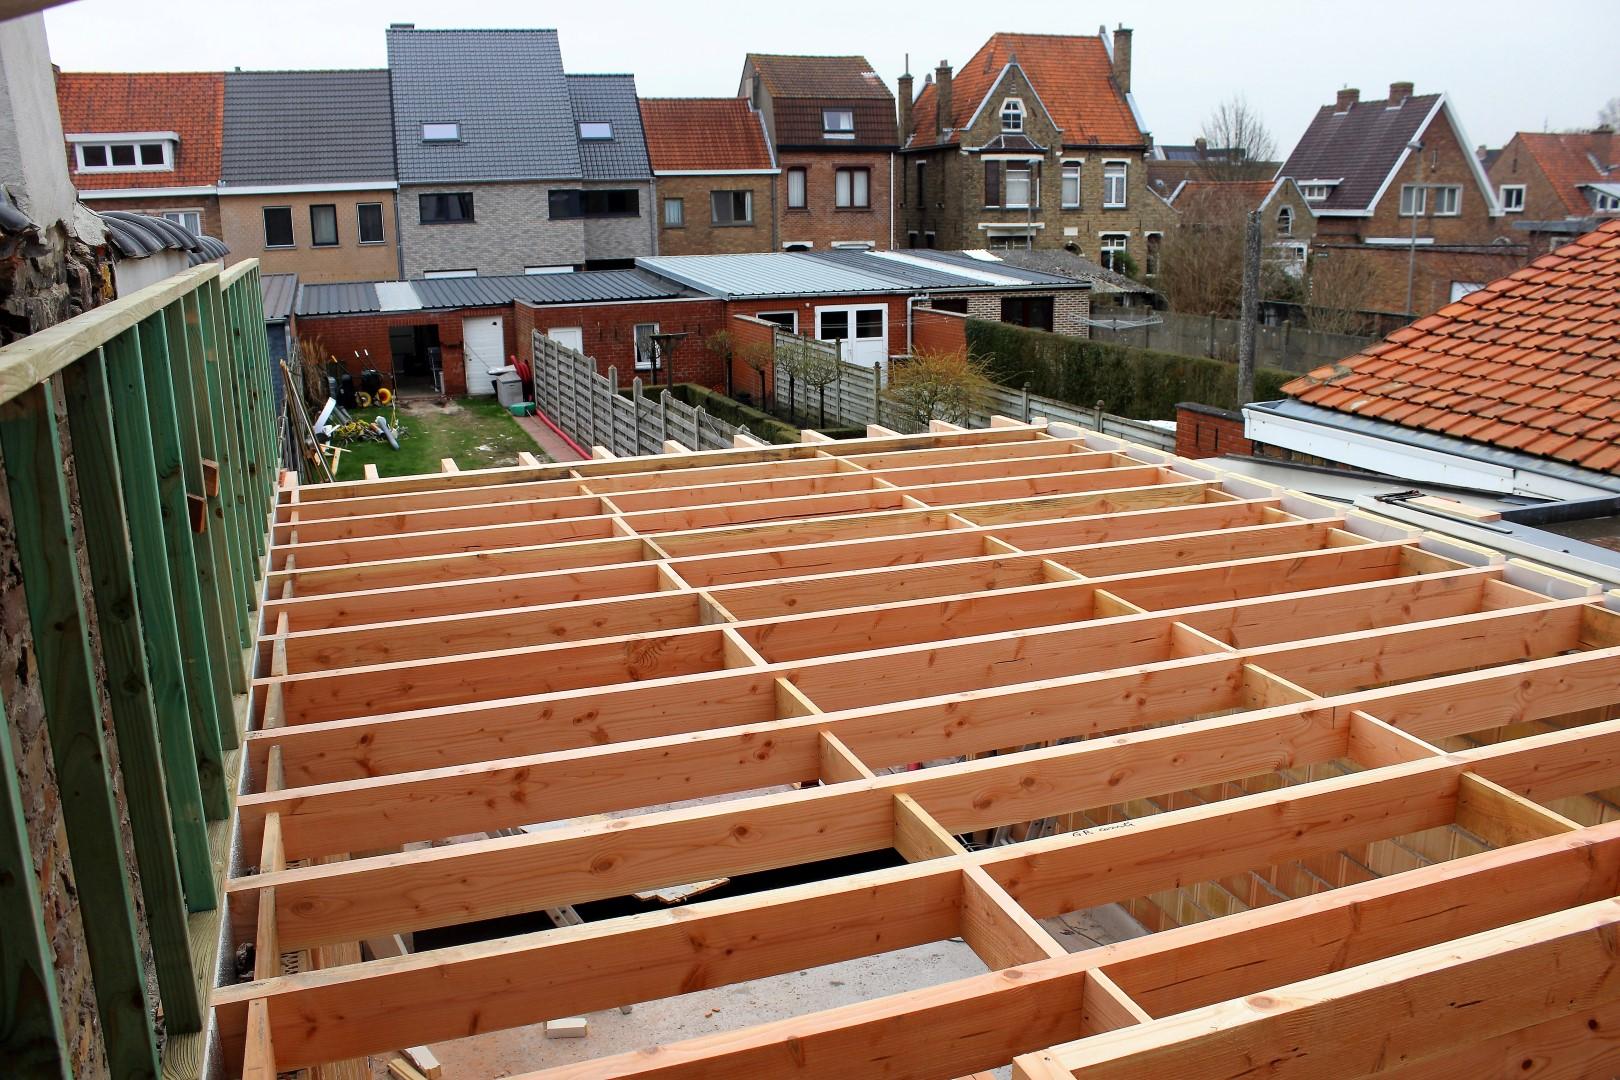 GB Construct, Daktimmerwerken, Dakwerken, Houten roostering, Isolatie, EPDM dakbedekking